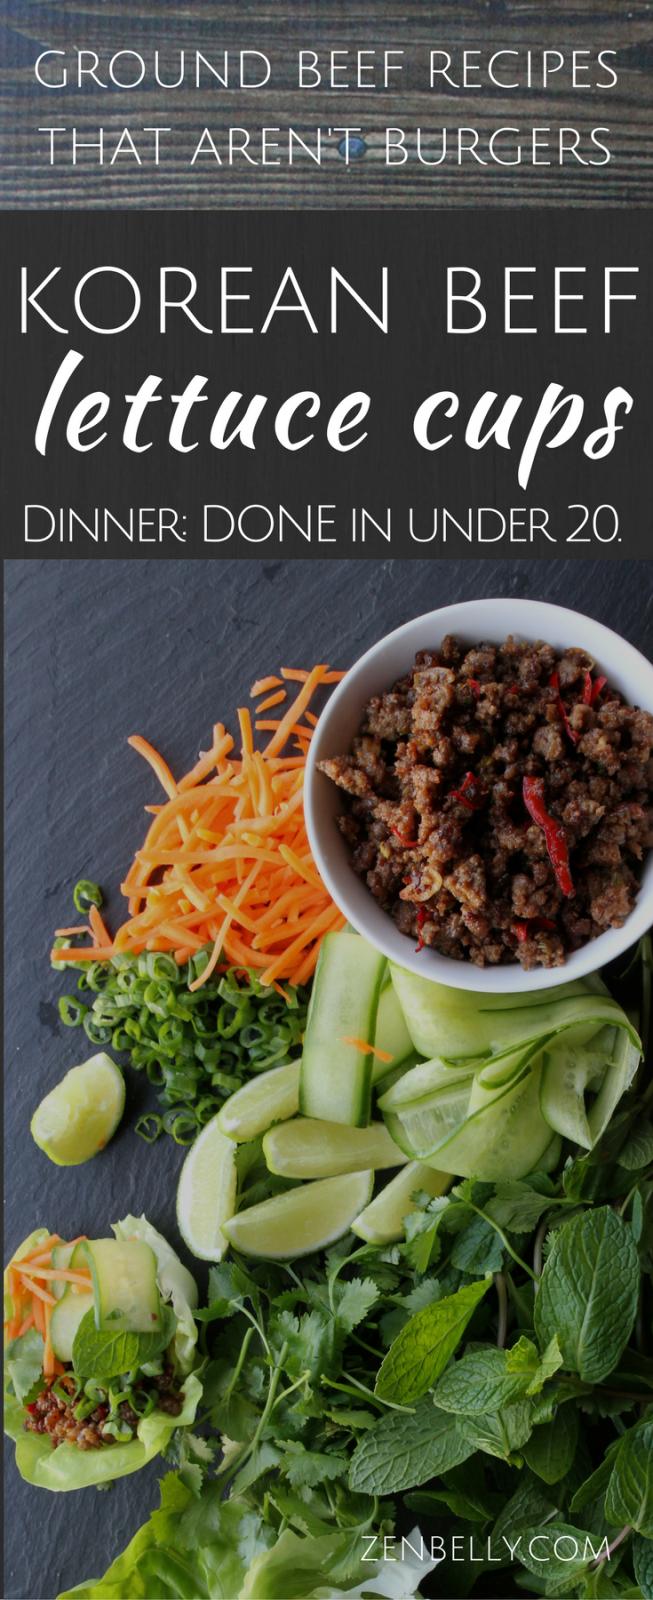 Korean Beef Lettuce Cups Recipe Korean Beef Ground Beef Recipes Lettuce Wrap Recipes